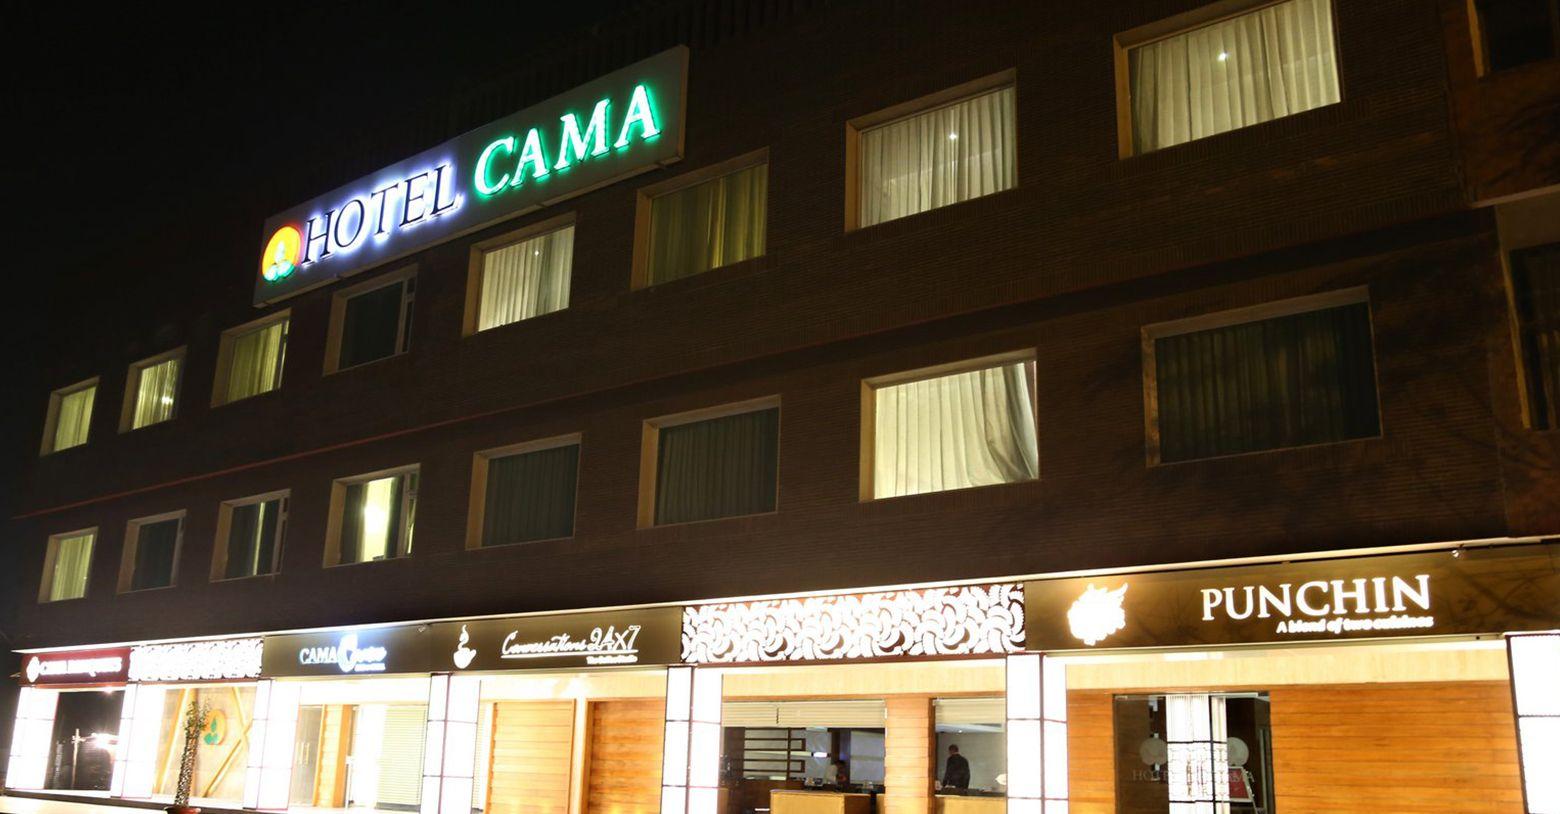 Hotel Cama   Hotel in Mohali near Chandigarh, Punjab, India